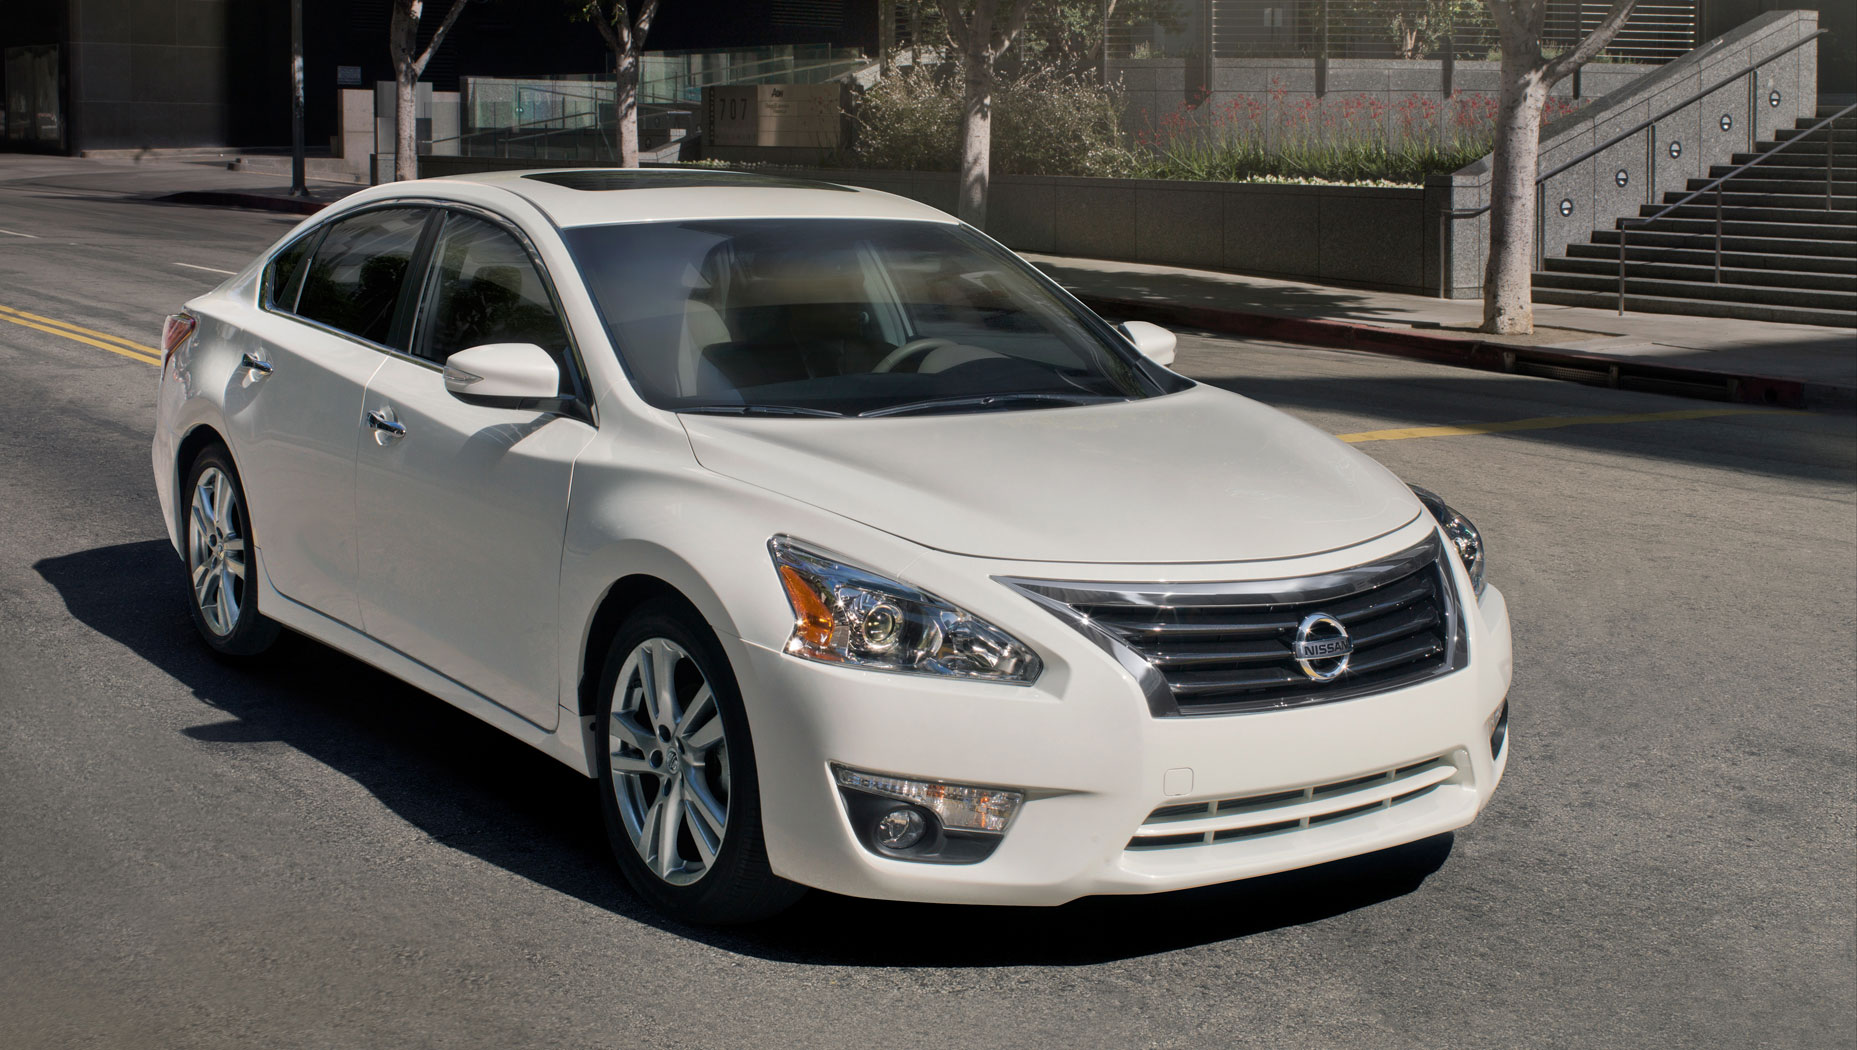 Facelift Cars - 2013-altima